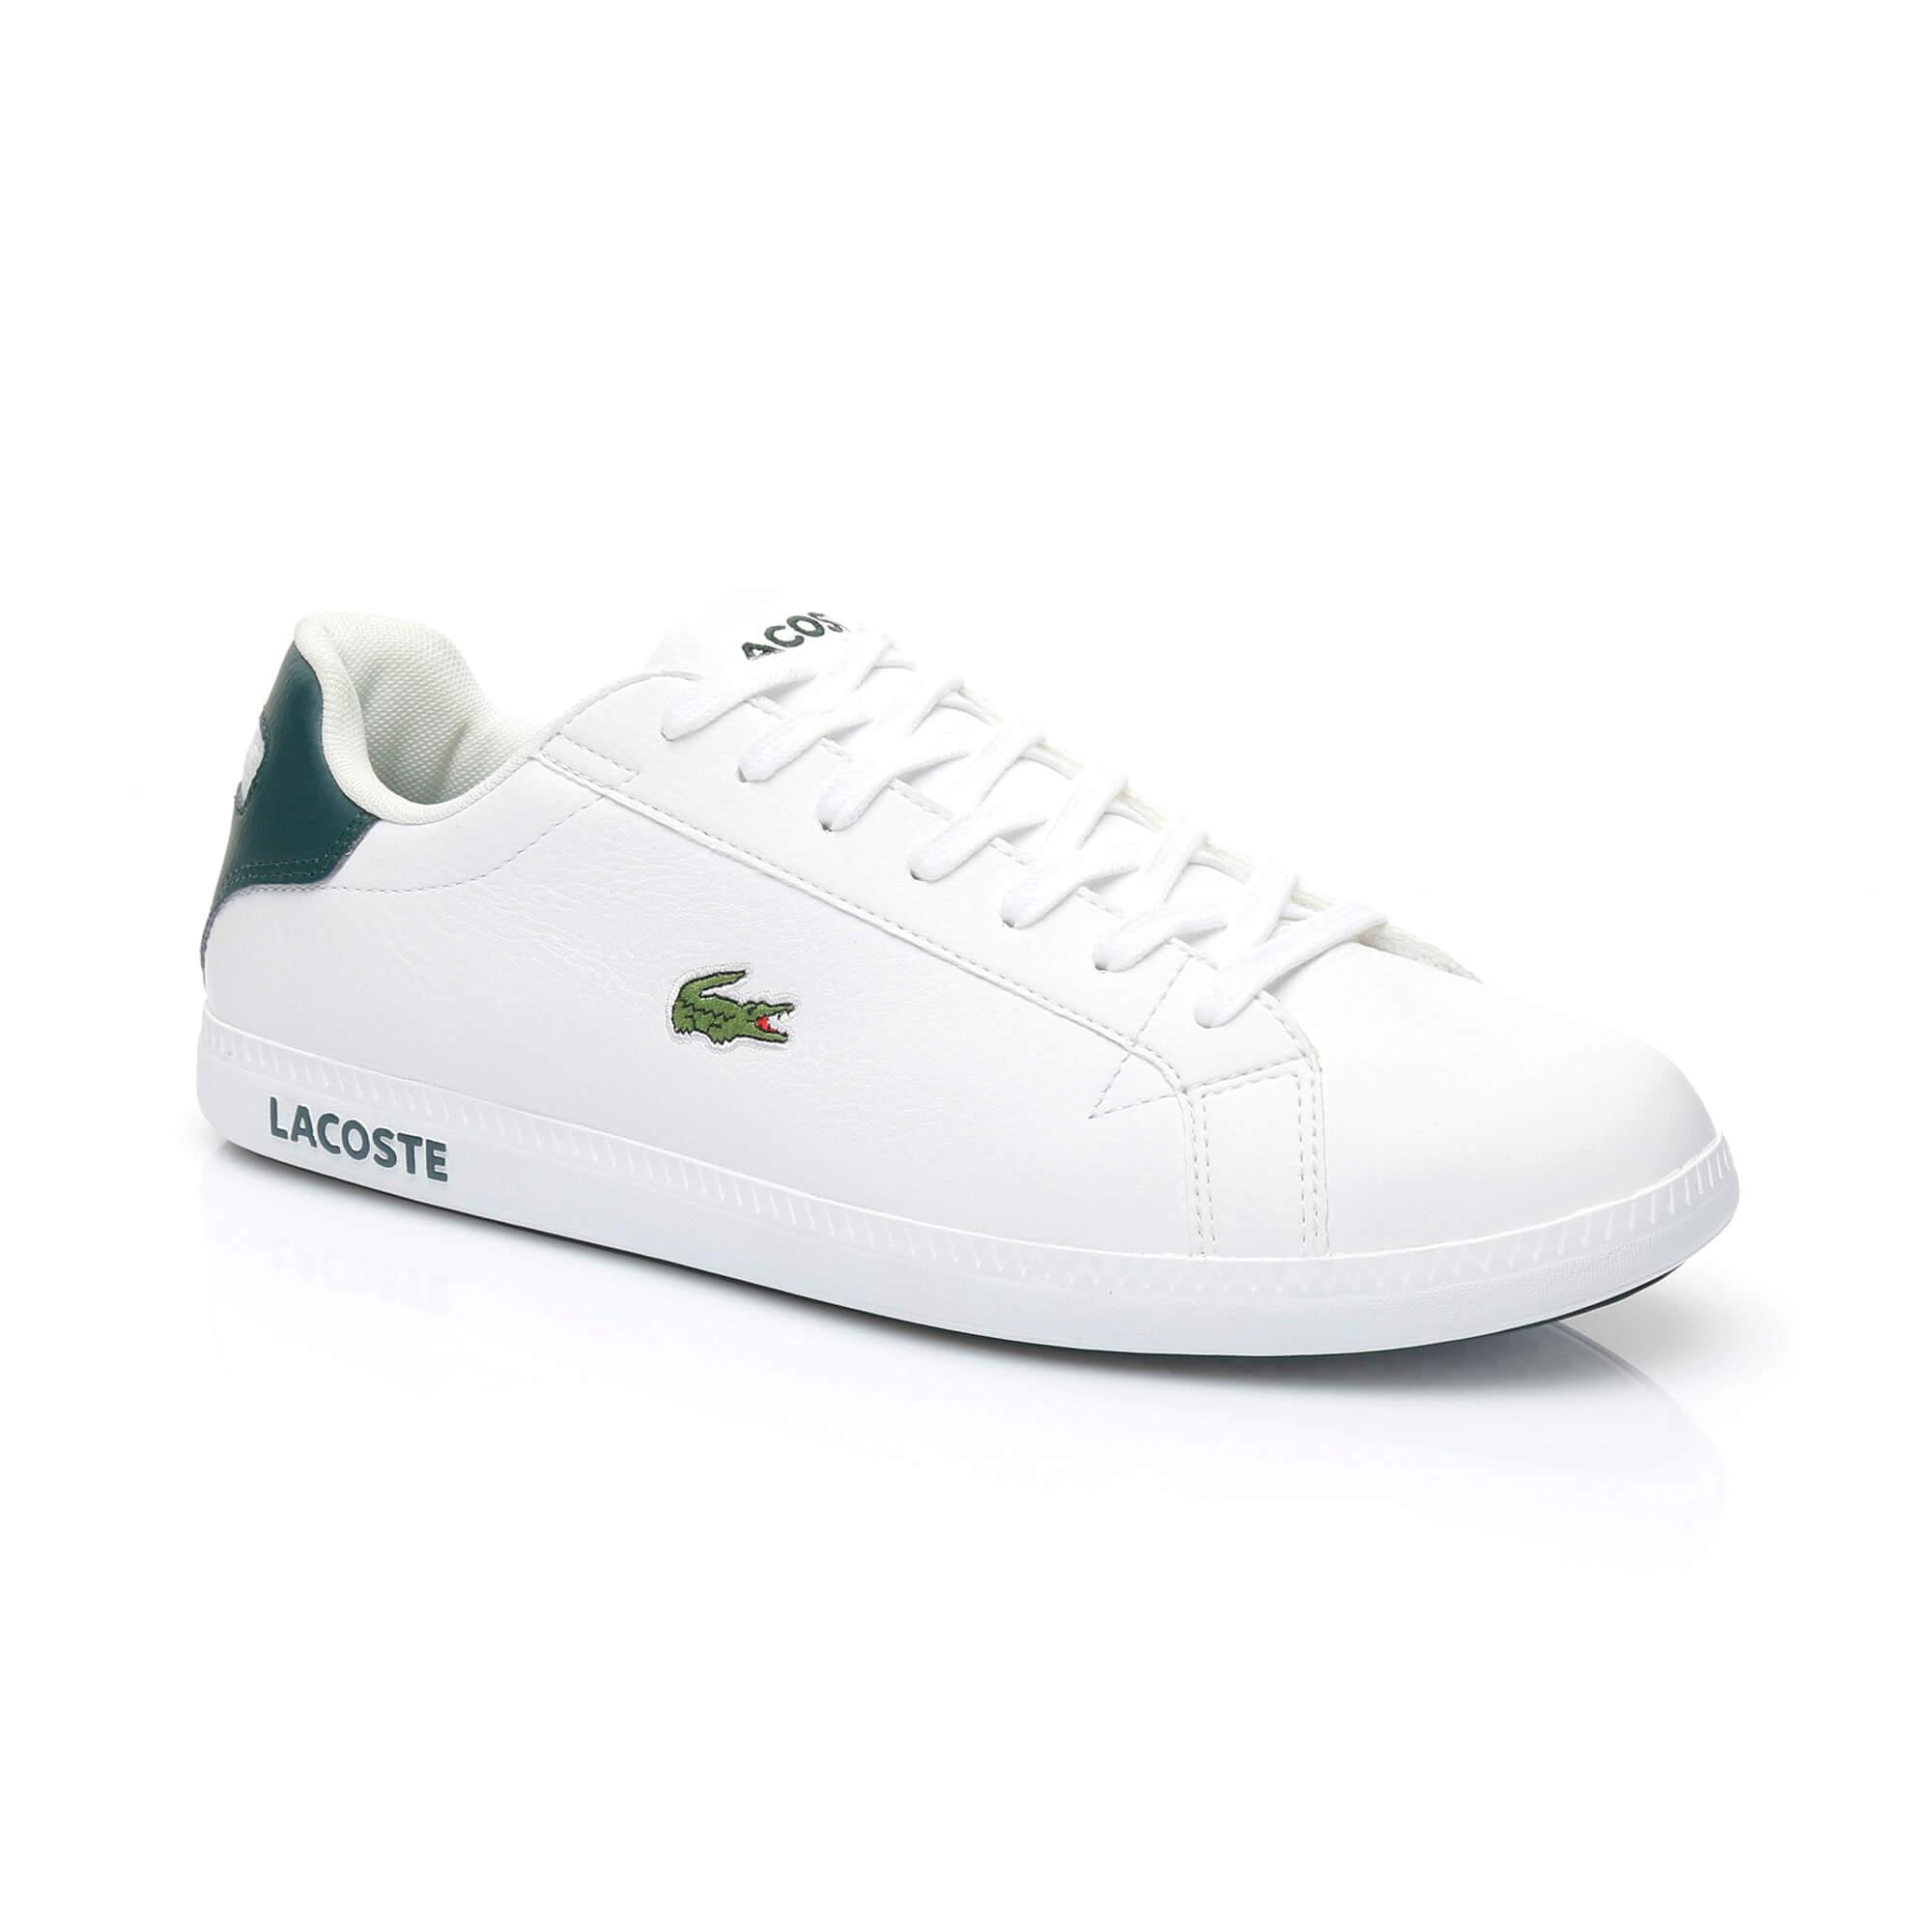 Lacoste Graduate LCR3 118 1 Men's Leather Sneakers